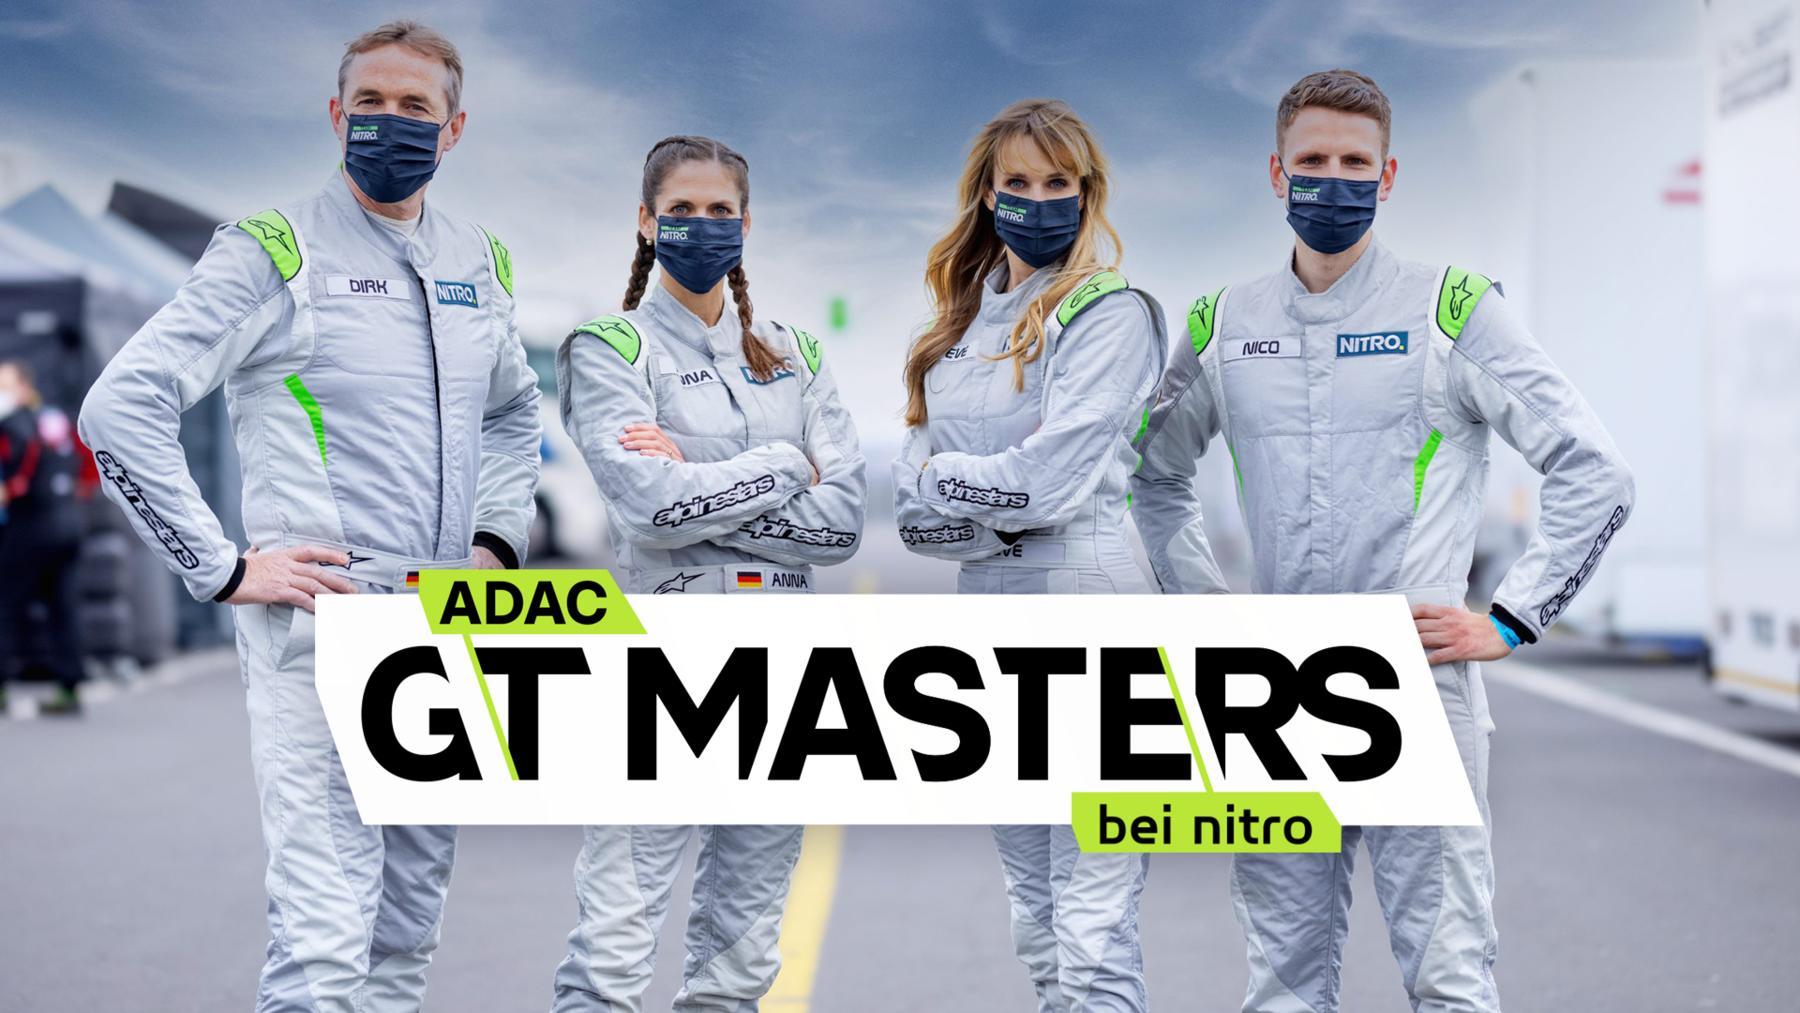 ADAC GT Masters bei NITRO